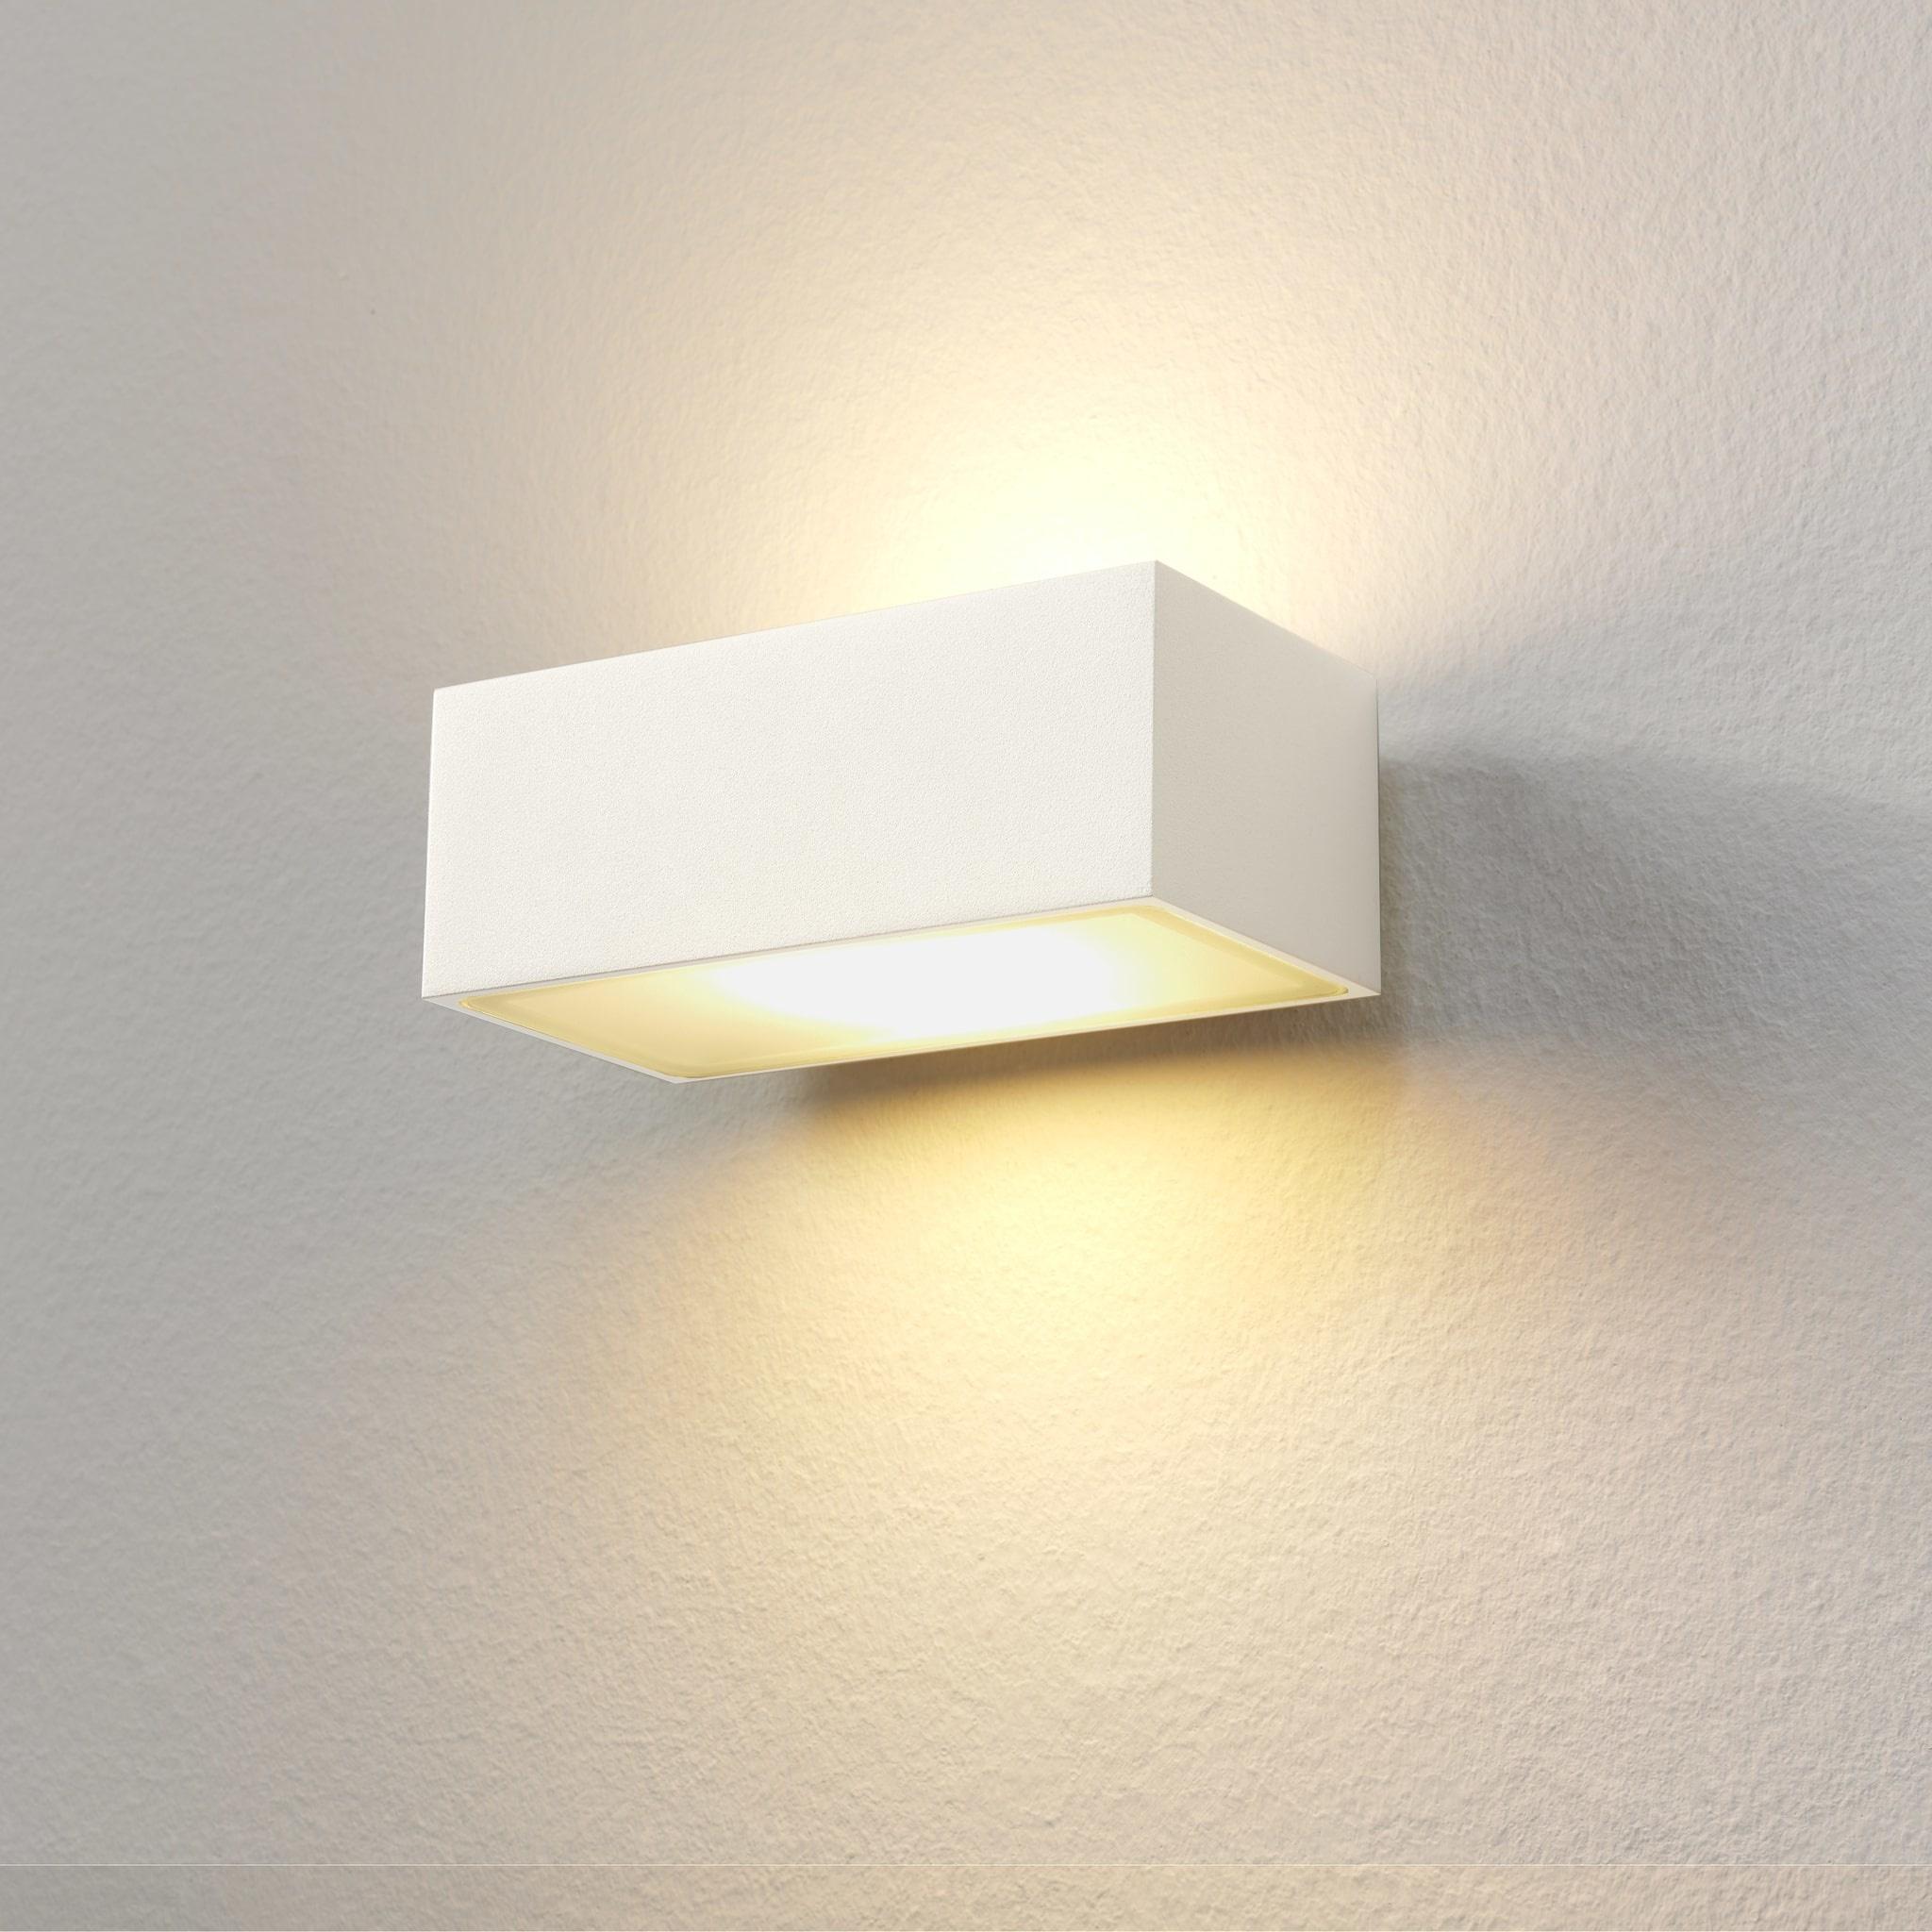 Artdelight Wandlamp Eindhoven L 13 cm wit